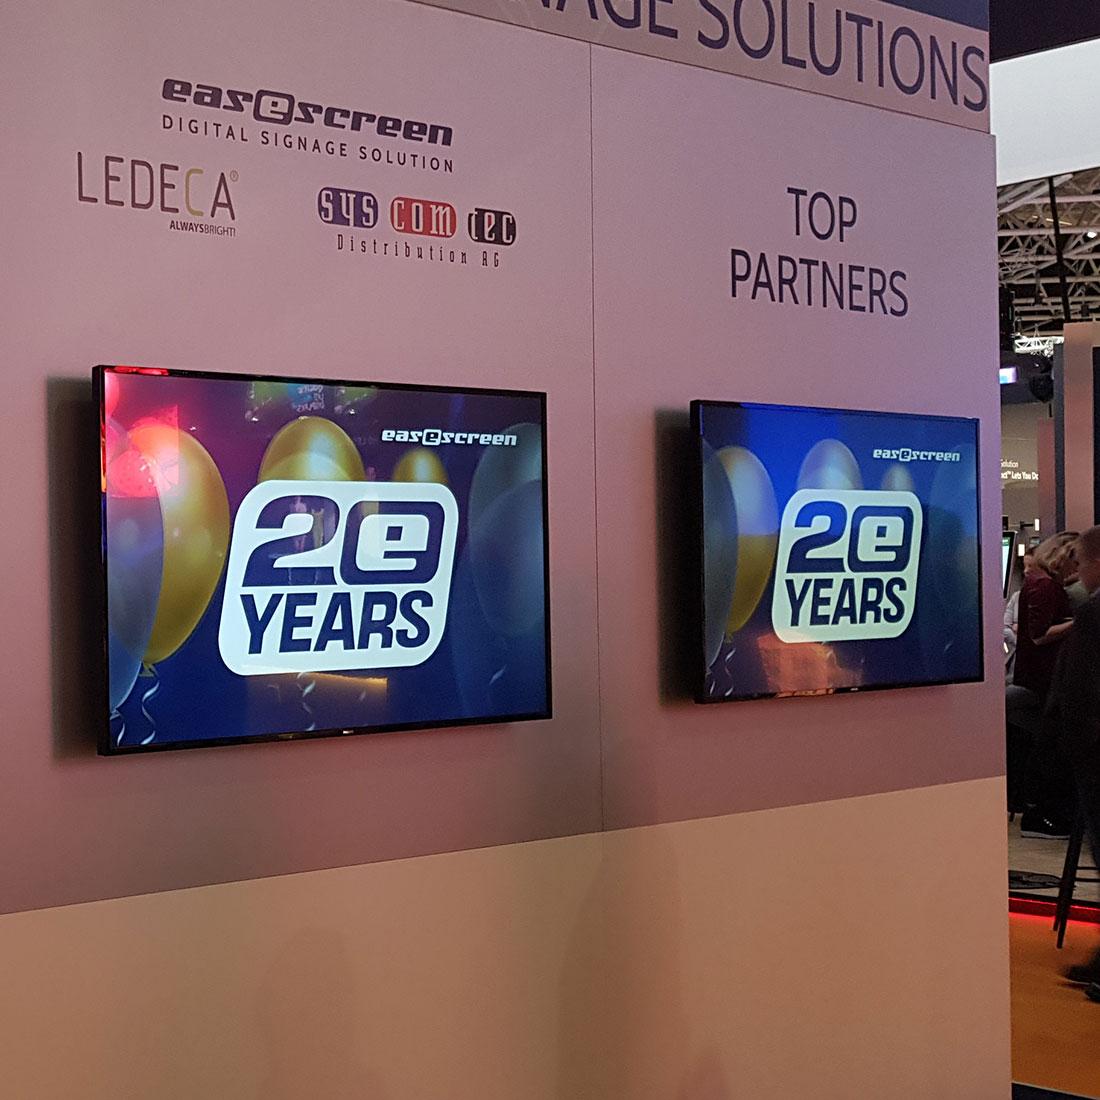 easescreen - ISE2020 - Digital Sigange